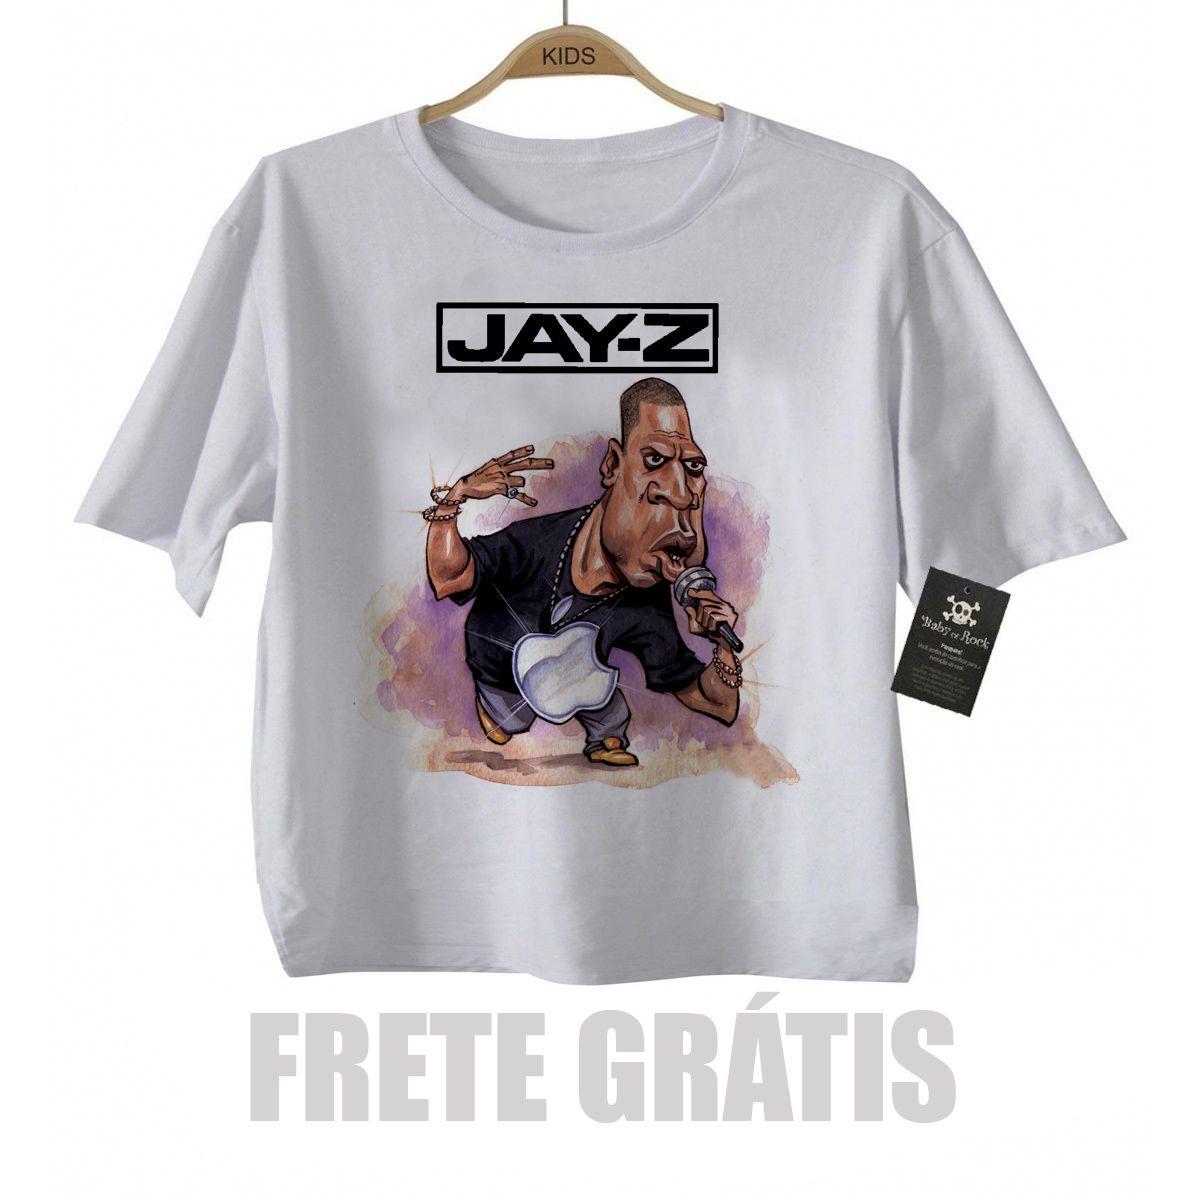 Camiseta infantil  Rap Hip hop   Baby Jay Z - White  - Baby Monster S/A